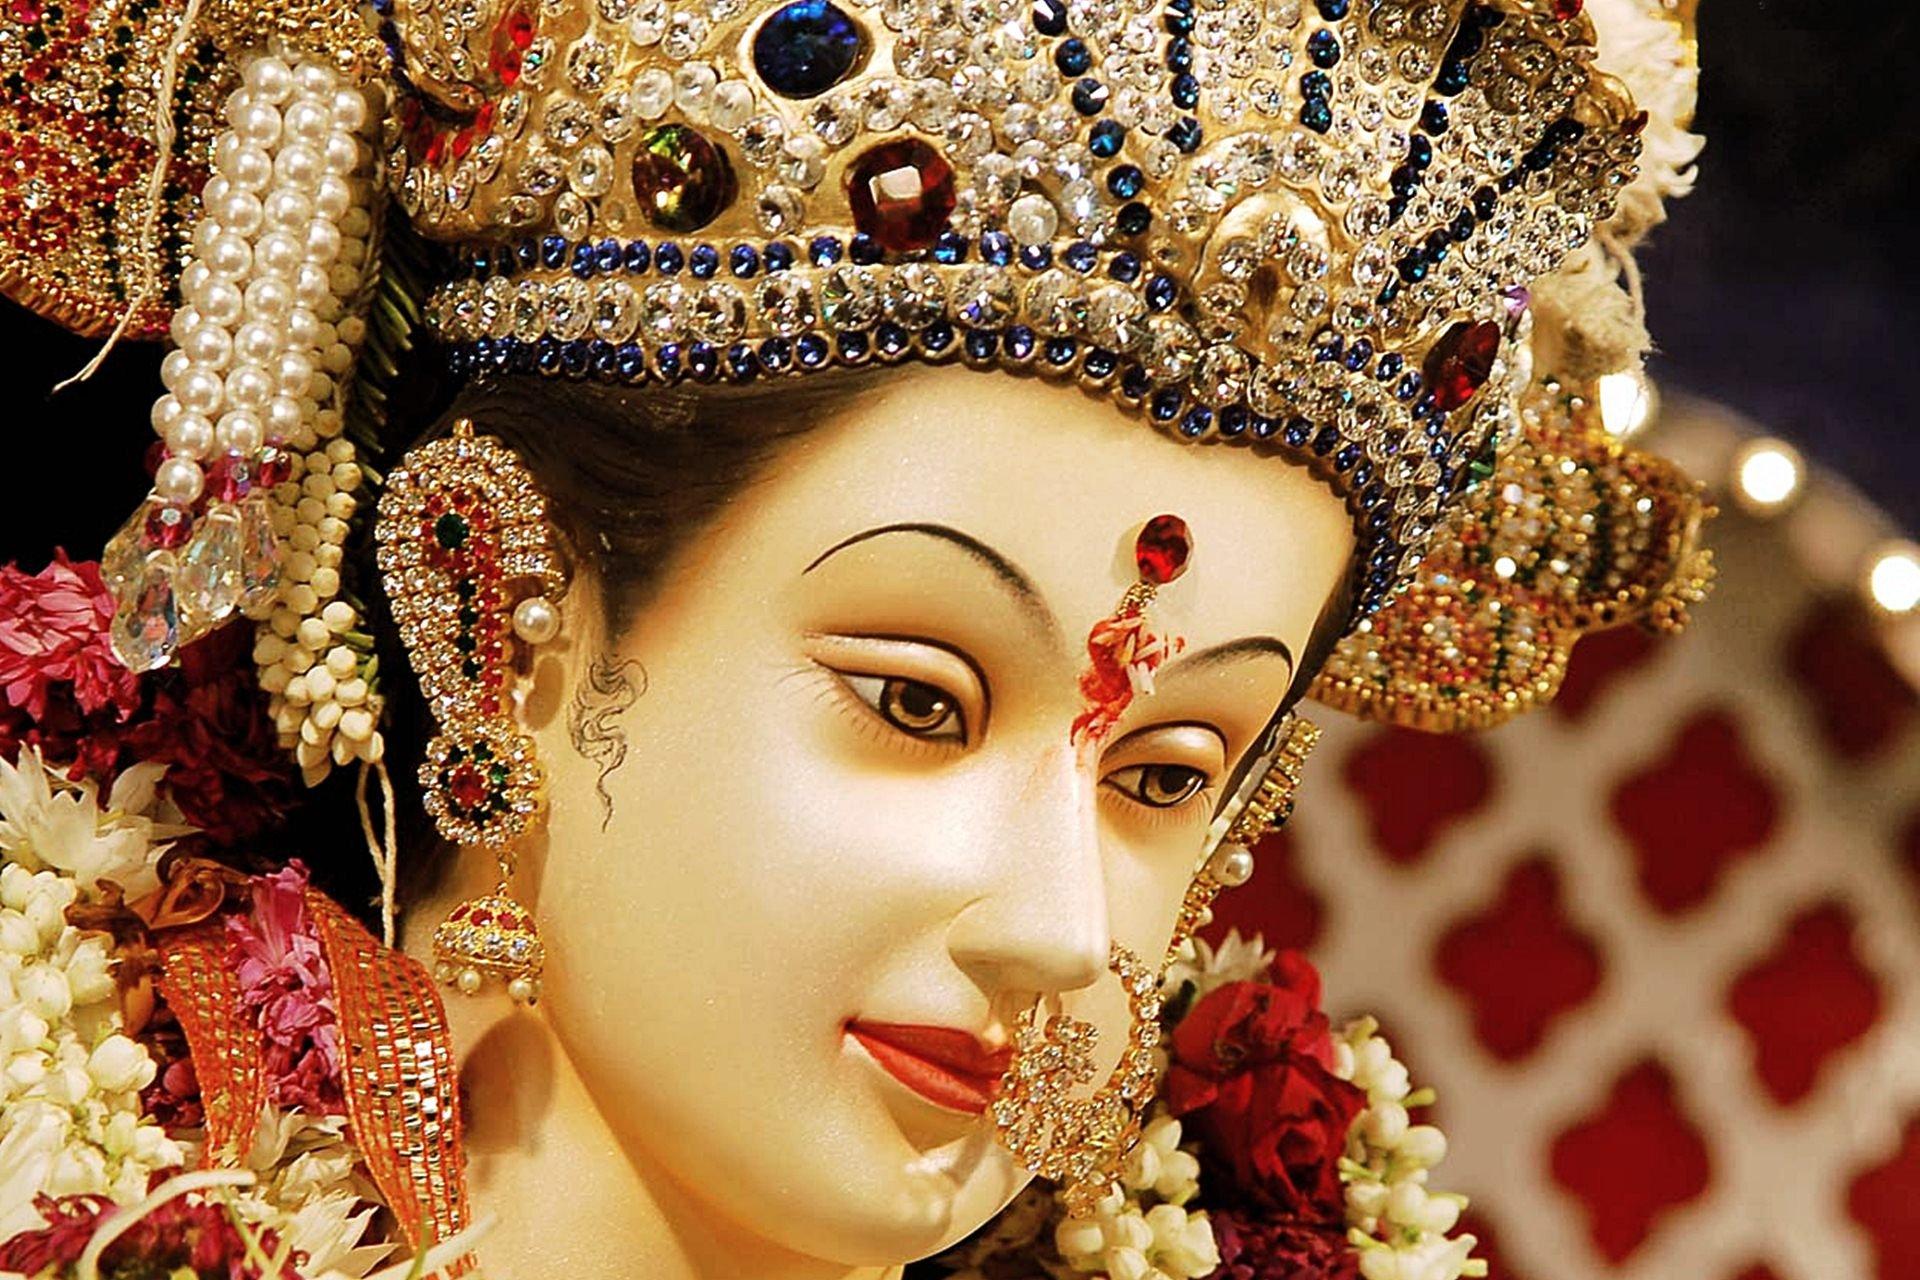 PunjabKesari,  Devi Durga,  Devi Durga Image, देवी दुर्गा